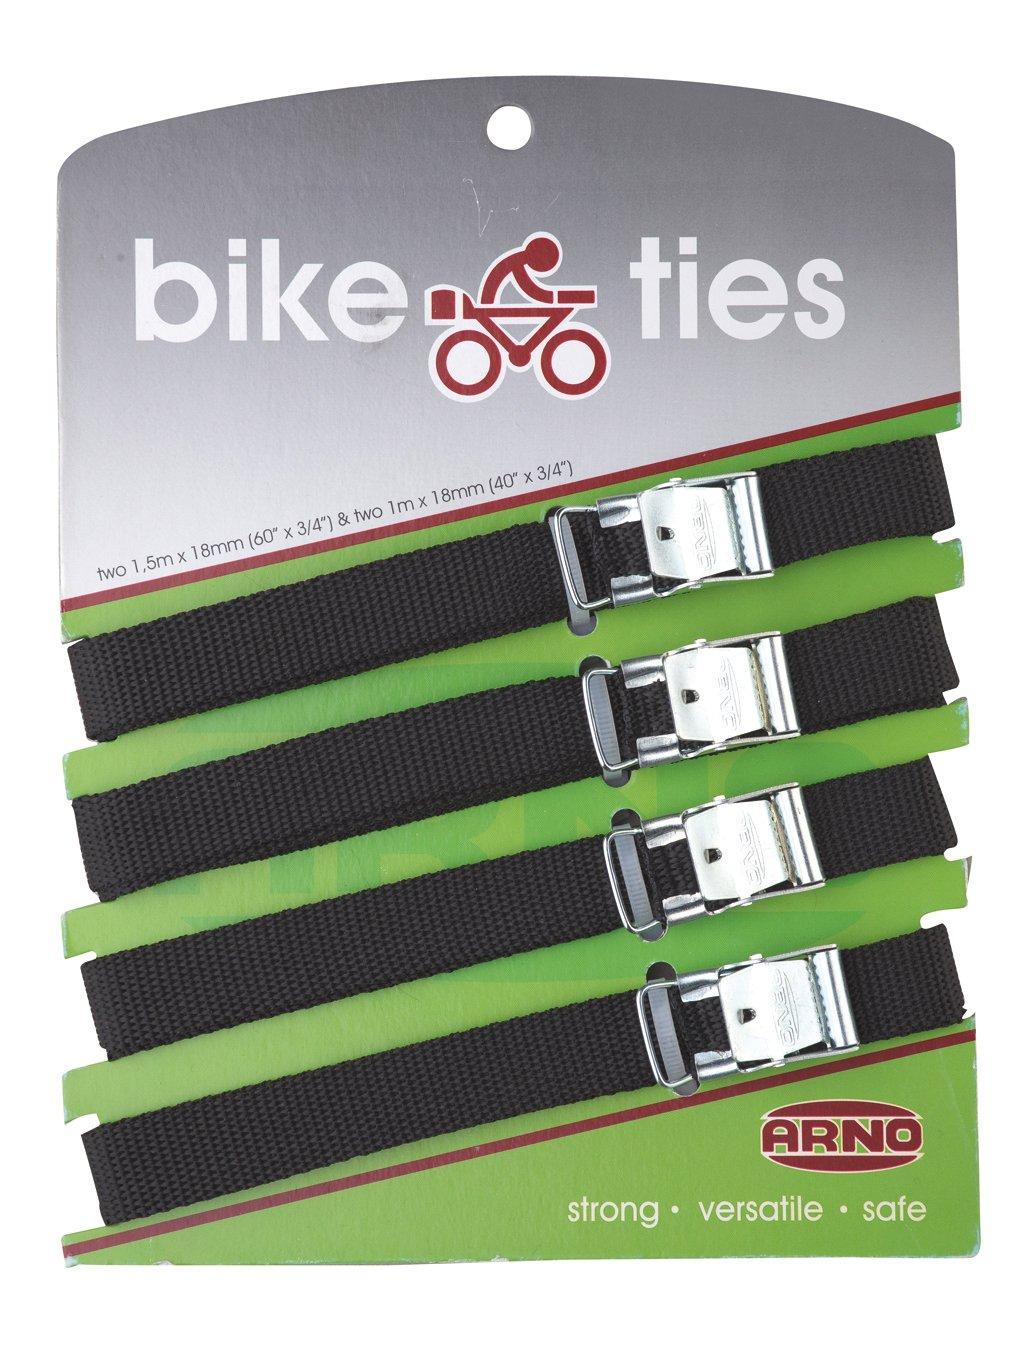 Arno - Bike Ties 18mm 4 pieces Van Assendelft - Hollander Bogaert 5410130